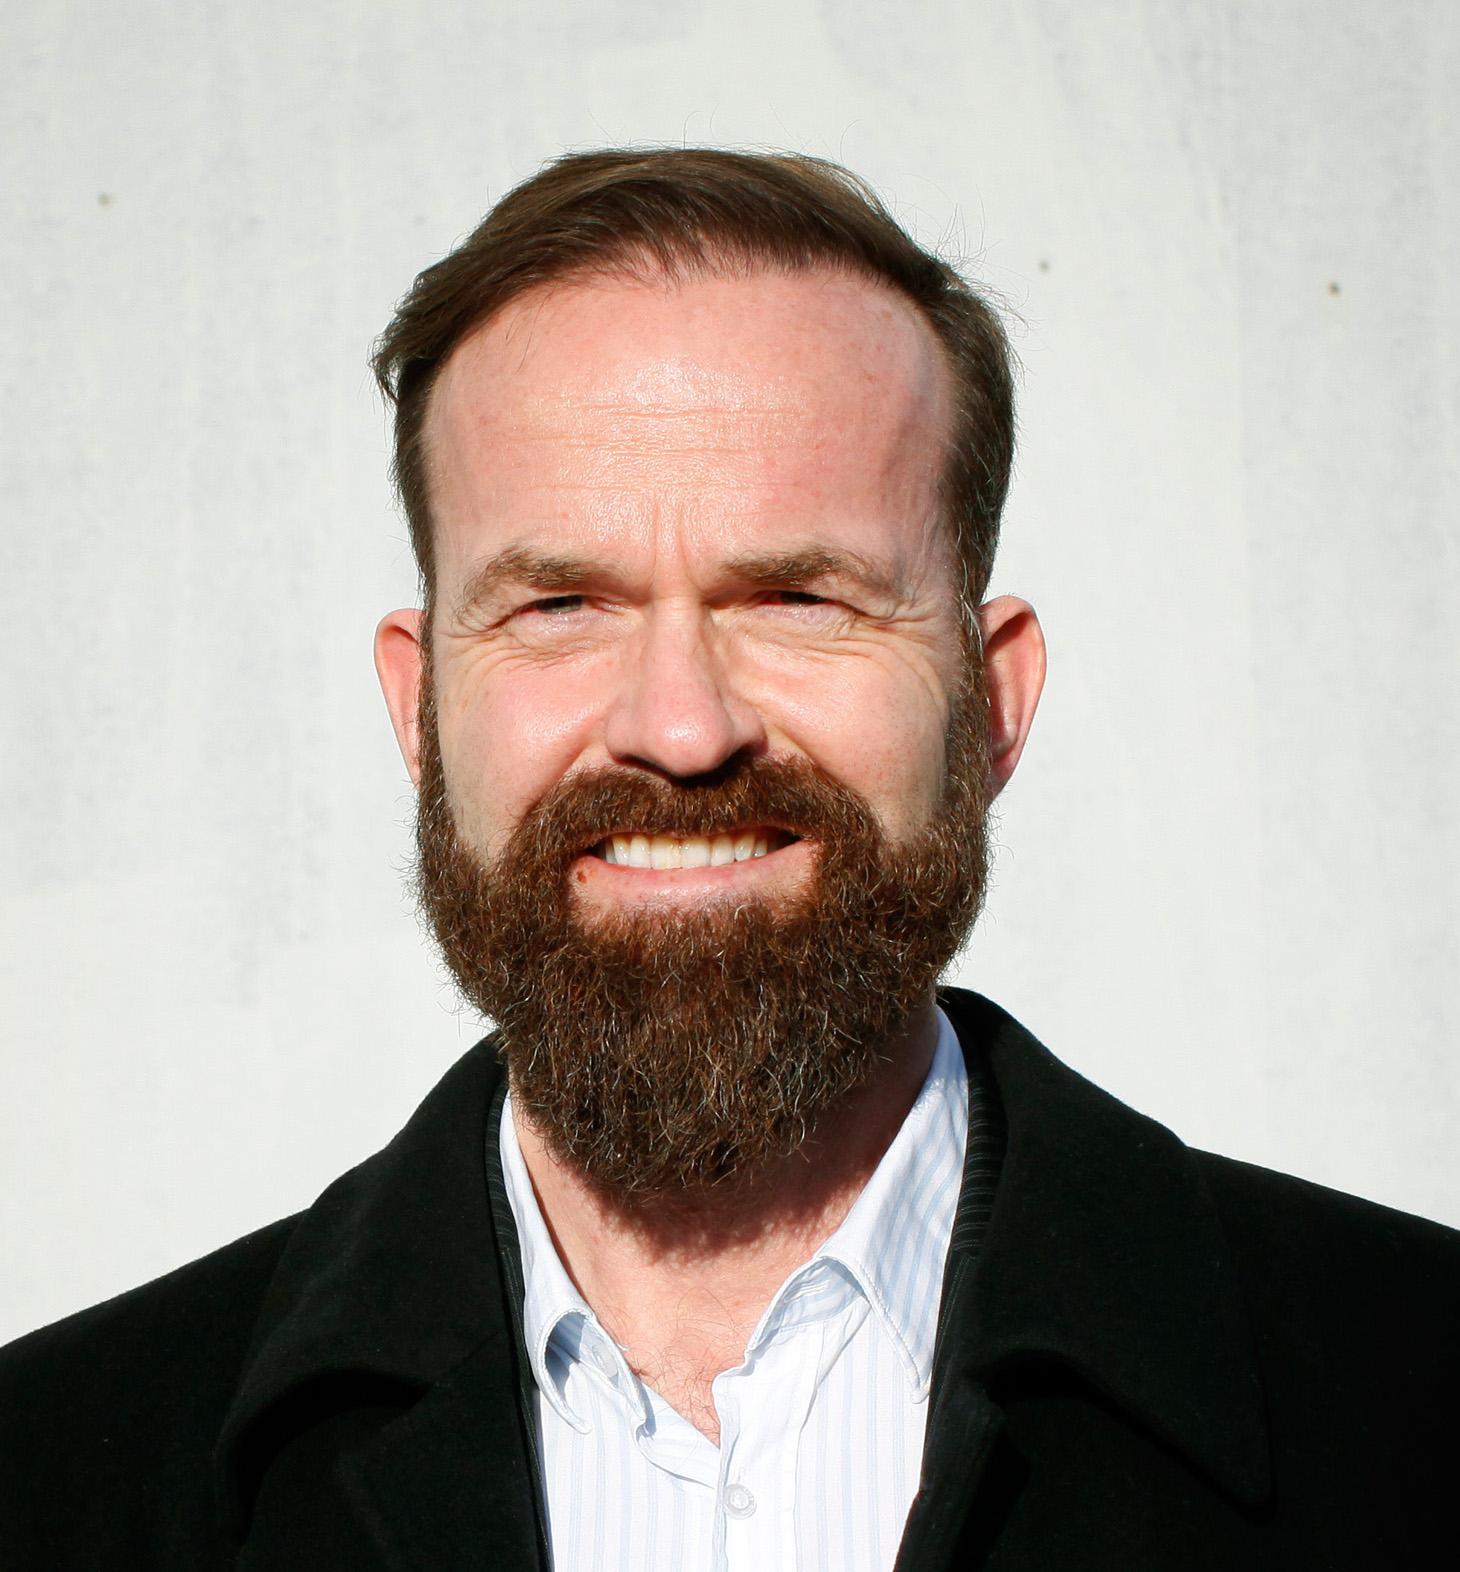 Fridrik R. Larsen, BBA, BS, MSC, Ph.D., CEO and owner of Larsen Energy Branding, Assistant professor at University of Iceland, President of The Icelandic Marketing Association